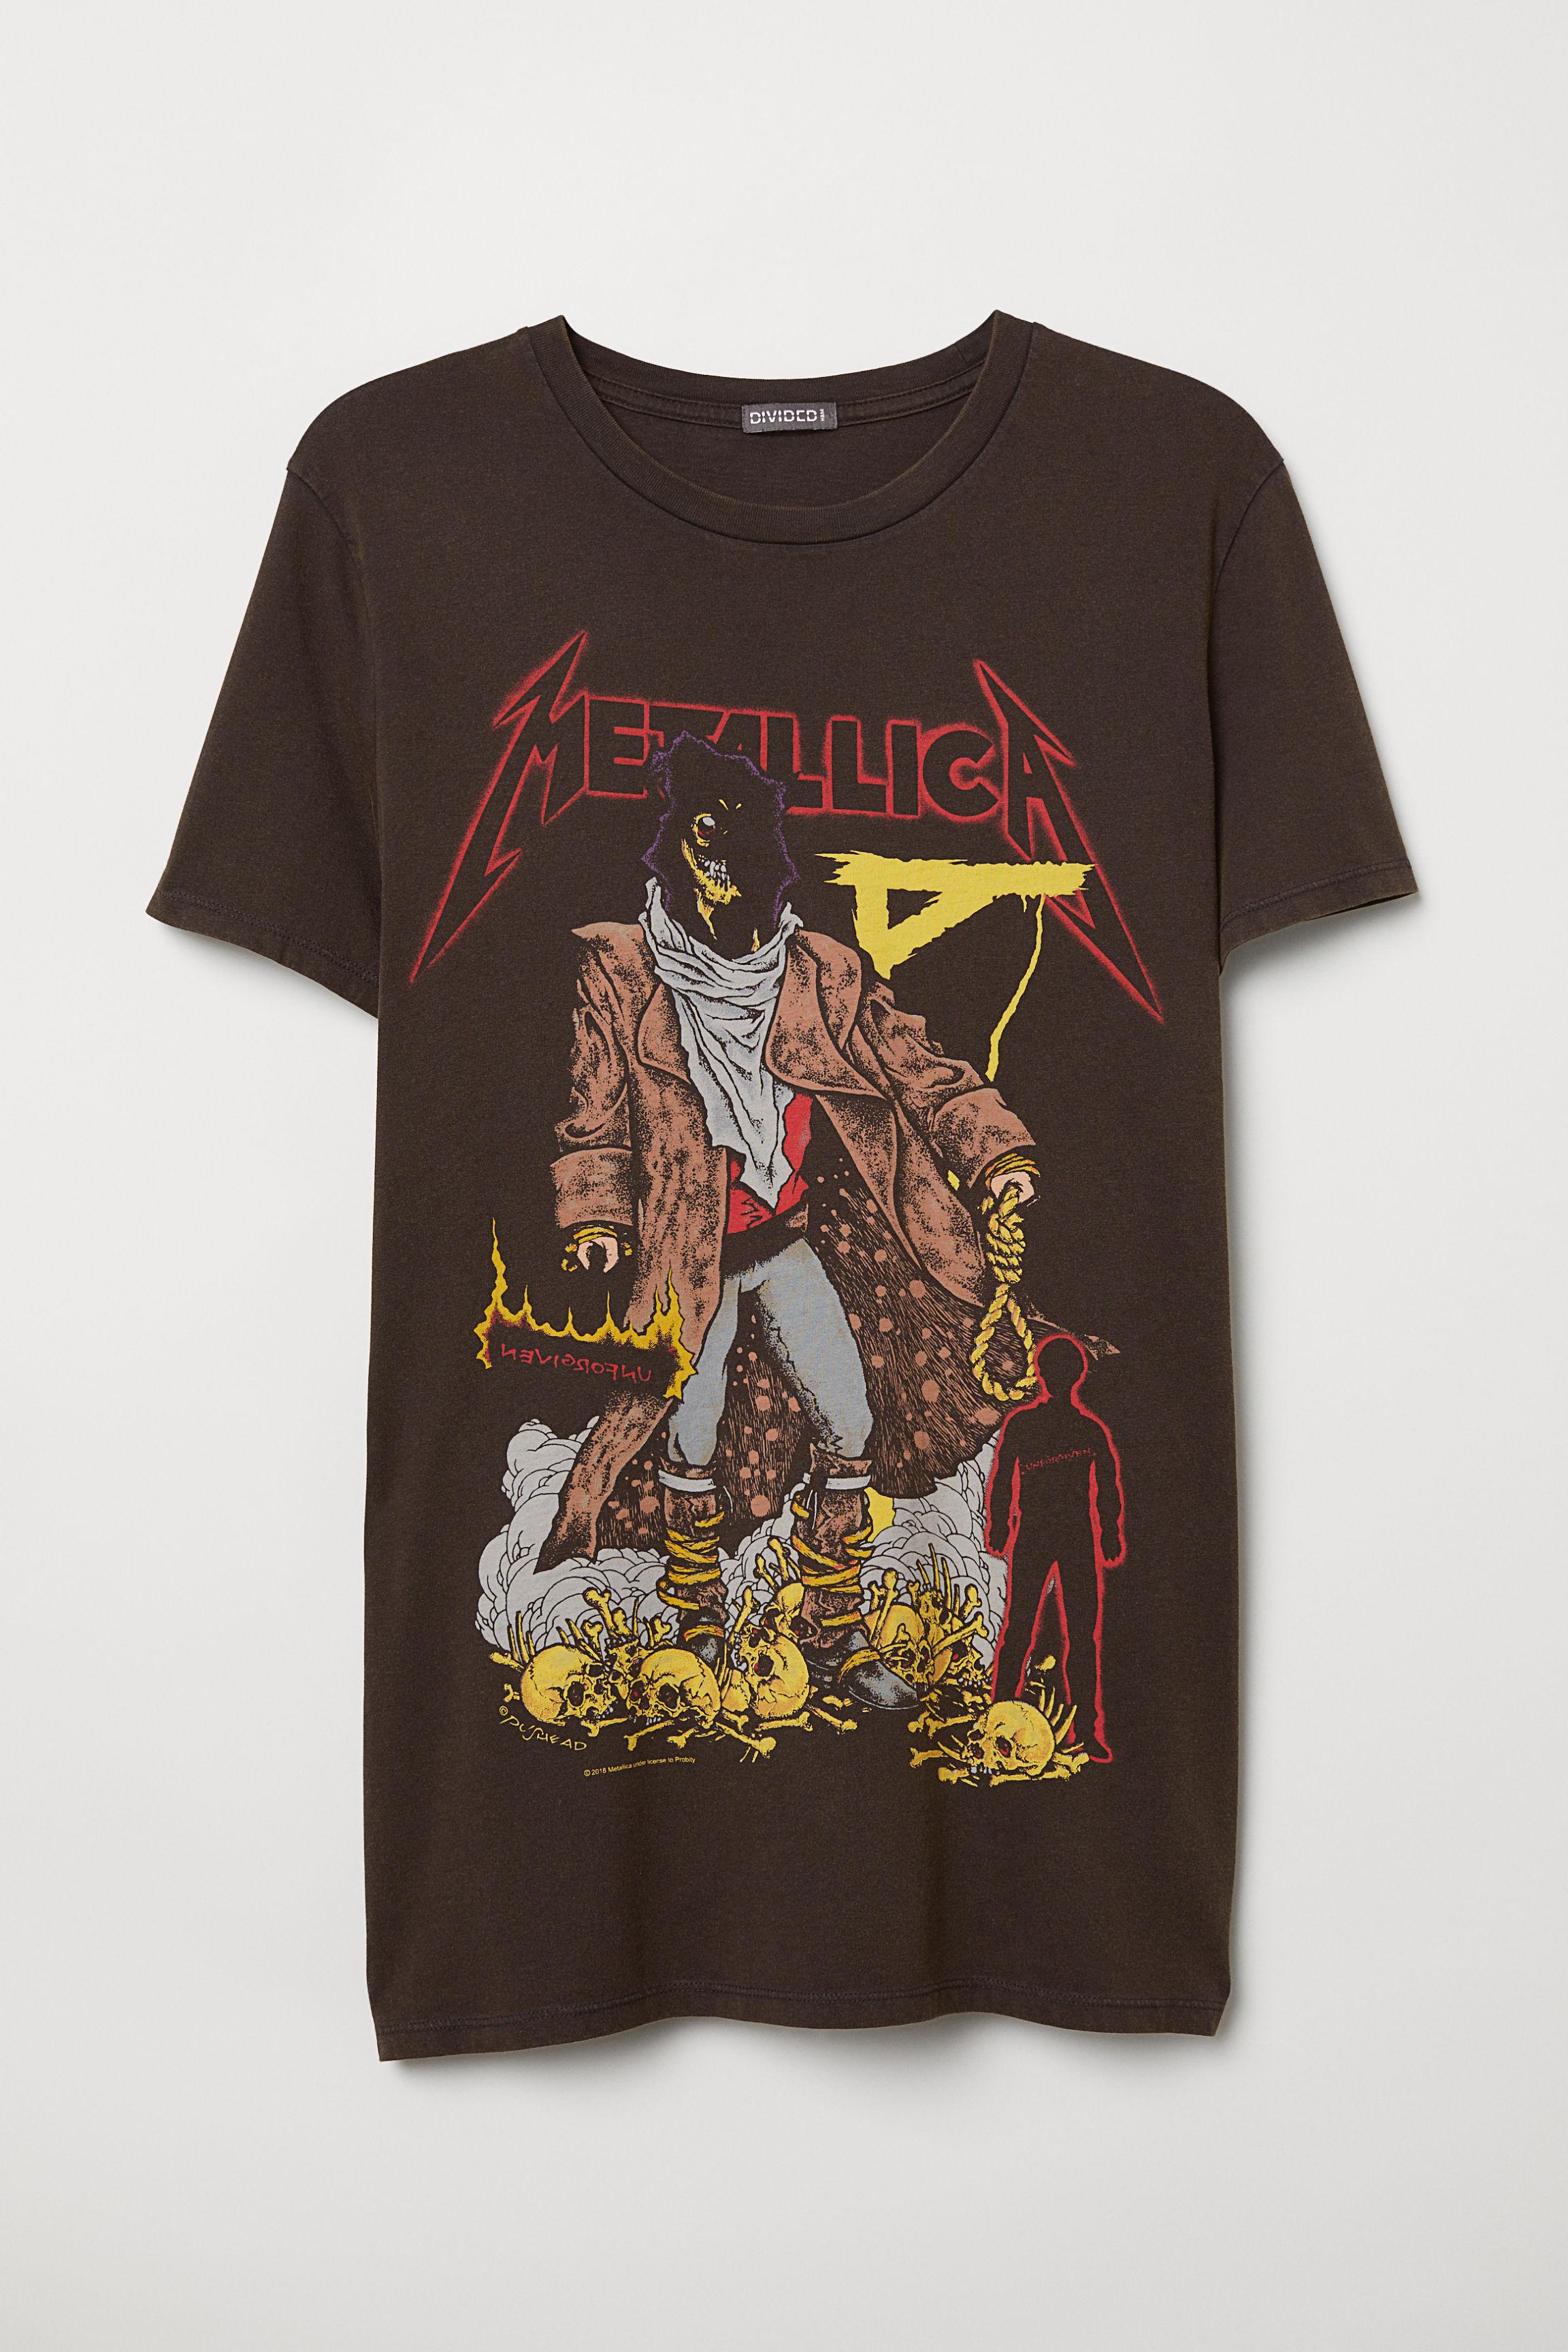 0ef26c43 Cotton Jersey T-shirt - Black/Metallica - Men | H&M CA